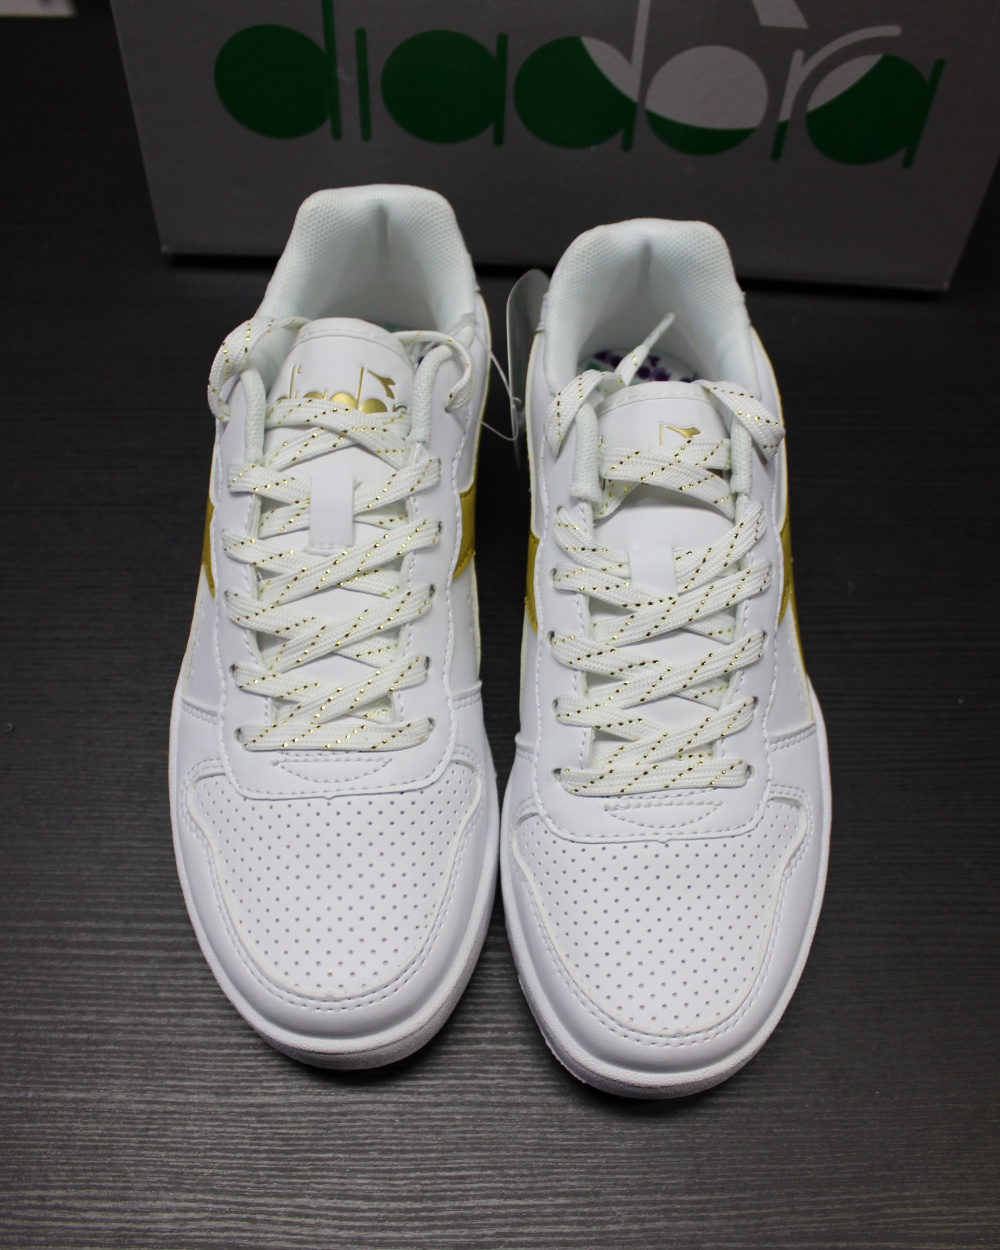 Diadora or Chaussures sportif Chaussures Sneakers Playground Femme or Diadora blanc e82a49